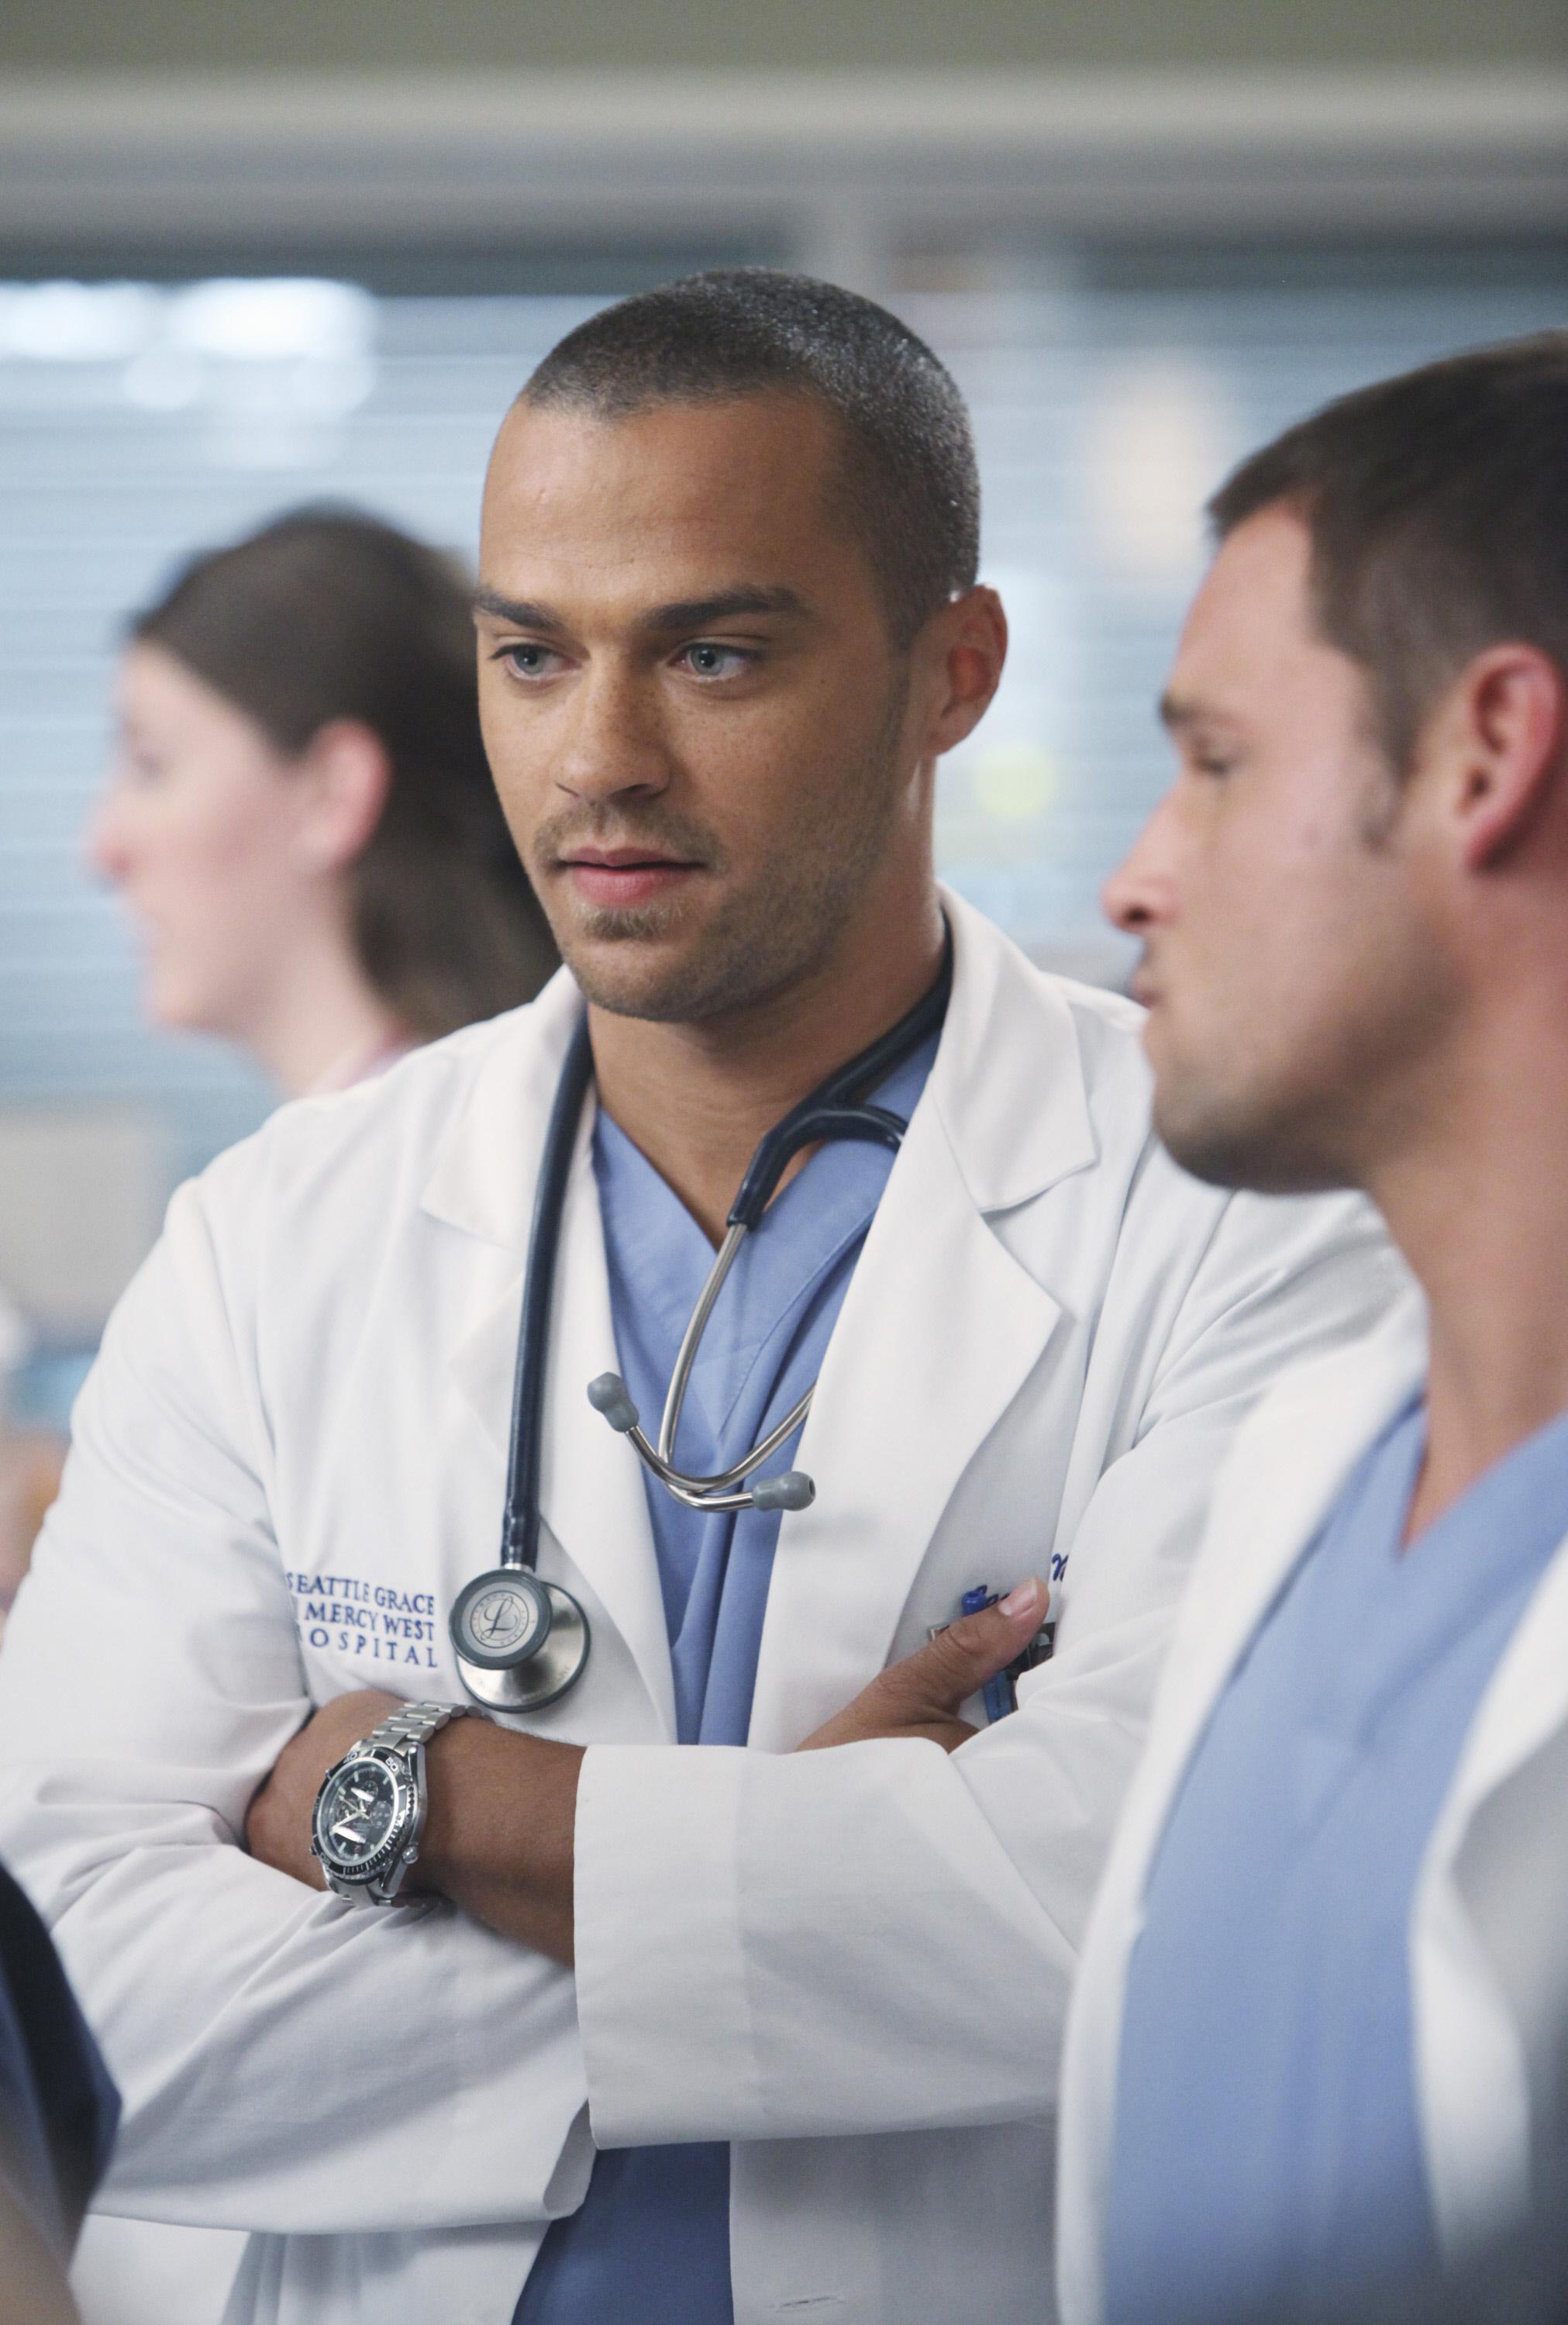 No. 4: Dr. Jackson Avery